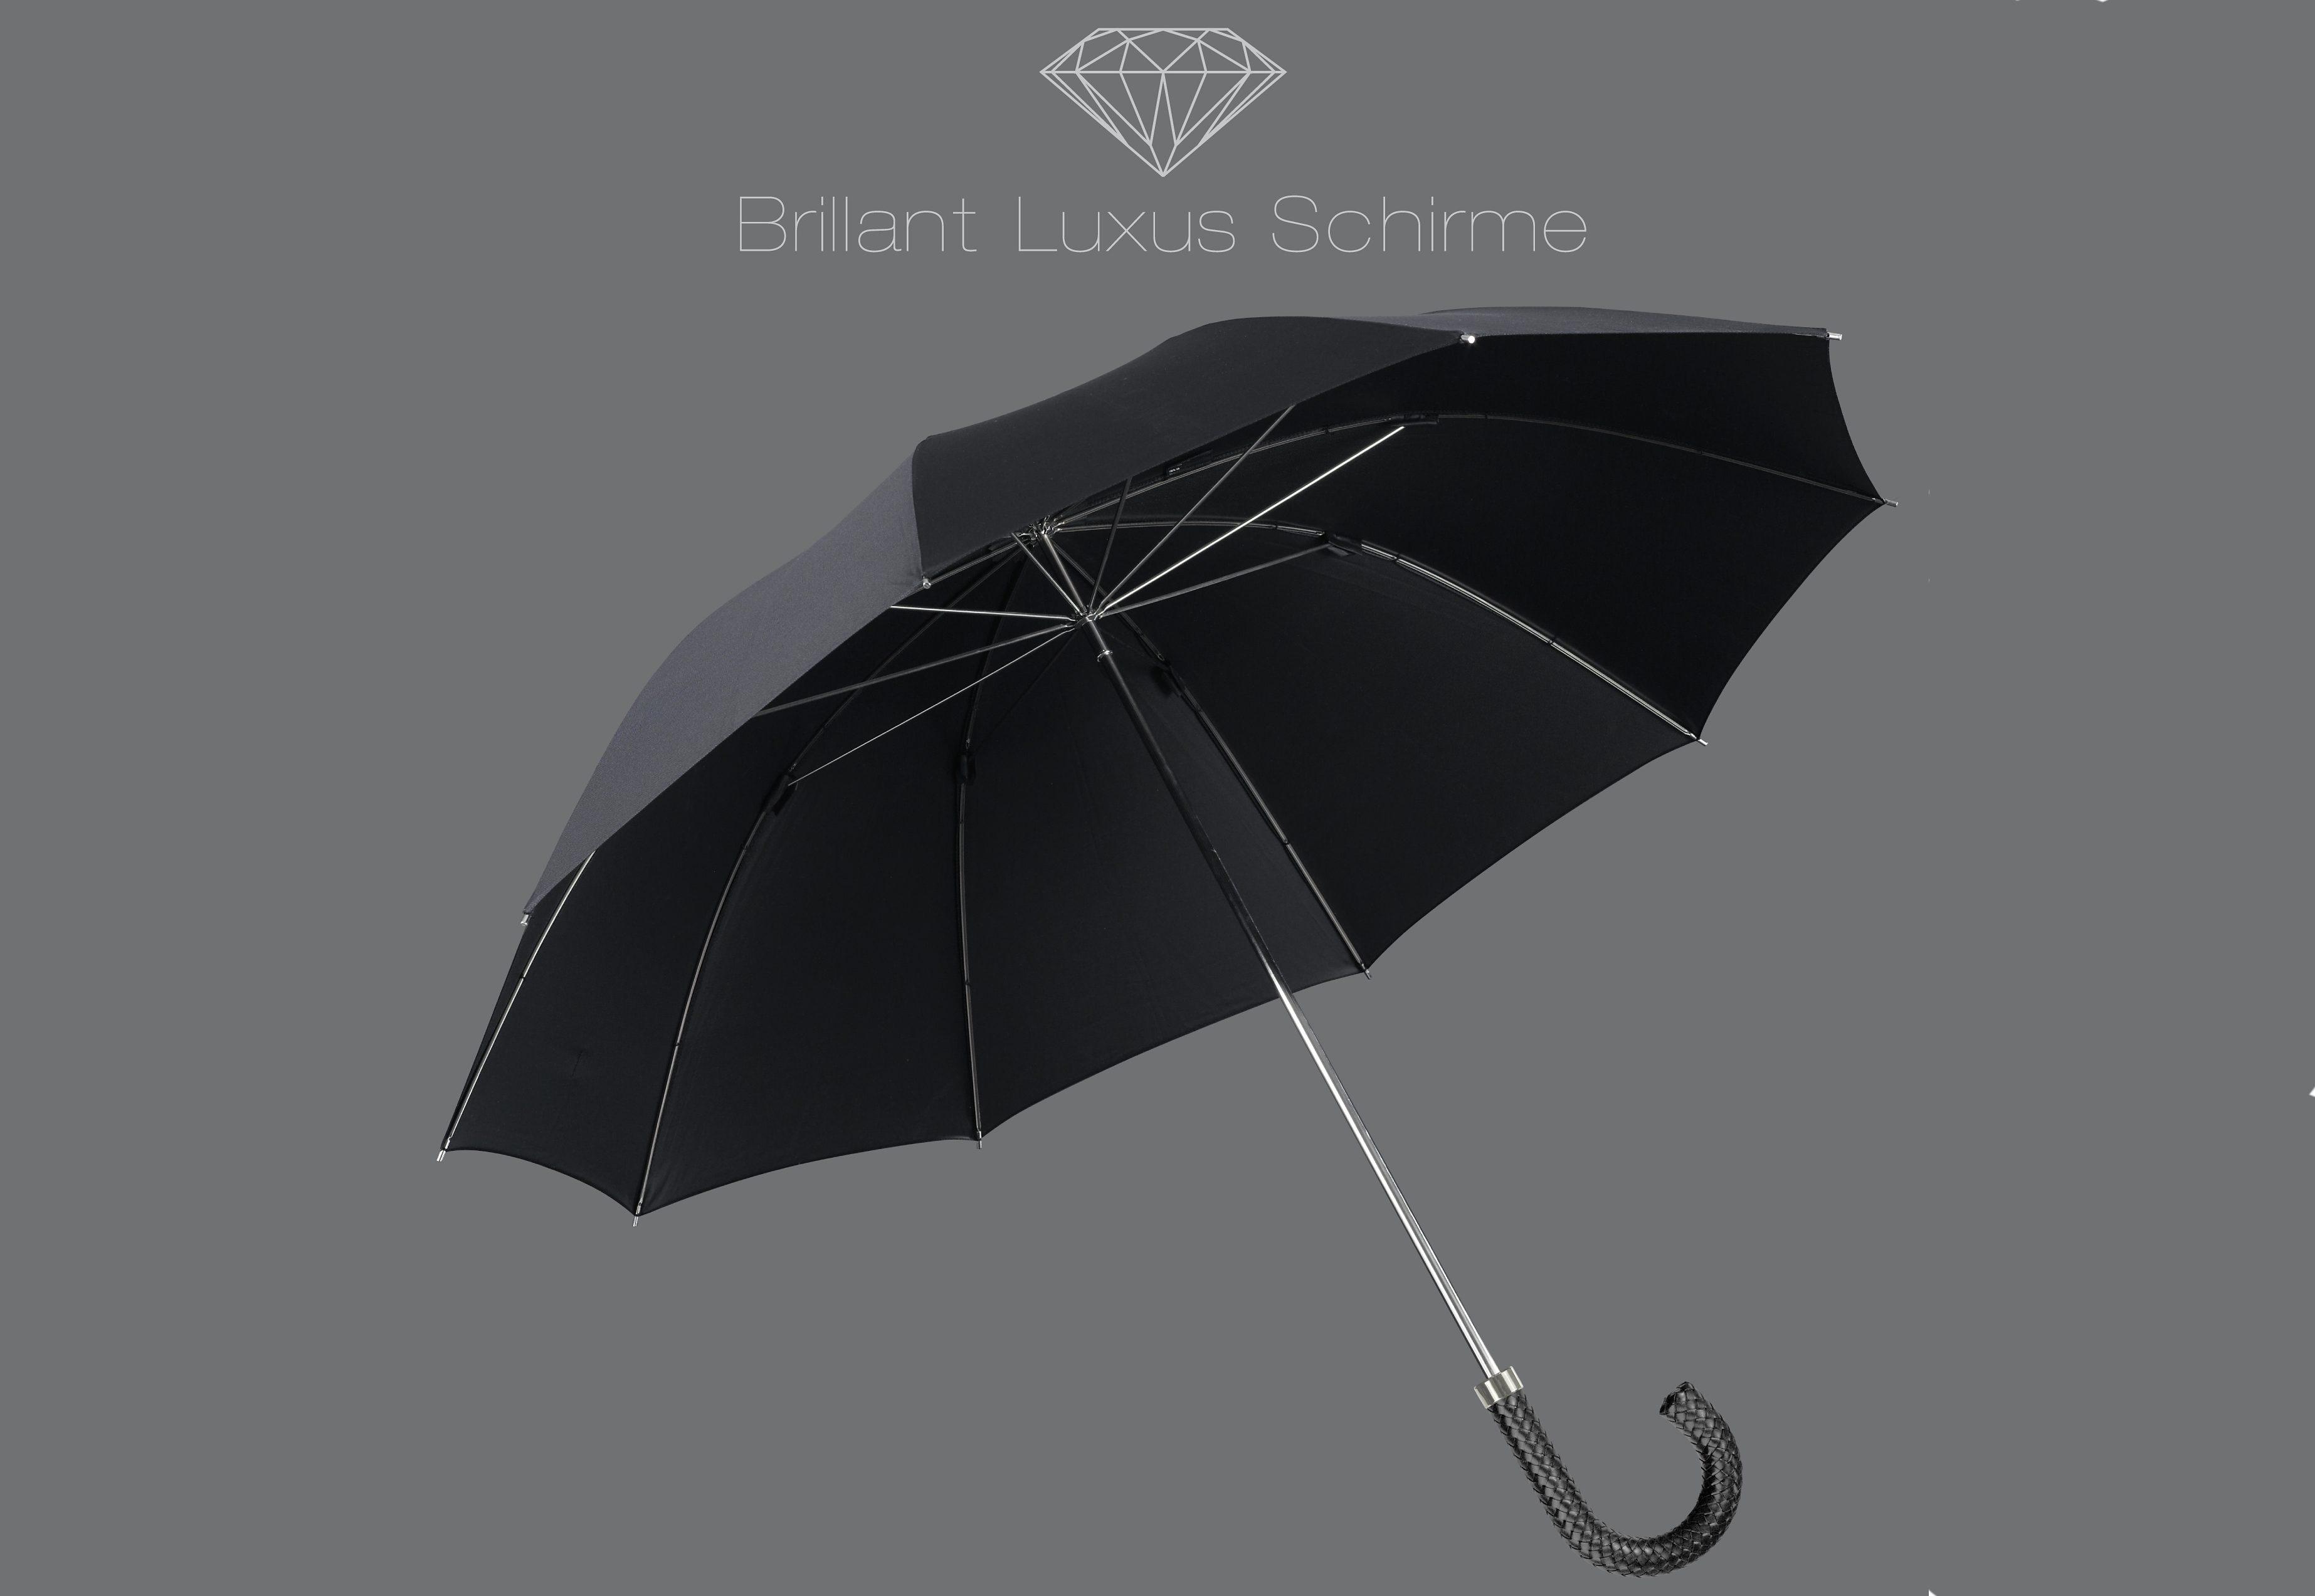 Euroschirm® Regenschirm mit Flechtleder-Griff, »Brillant Luxus Herrenschirm«